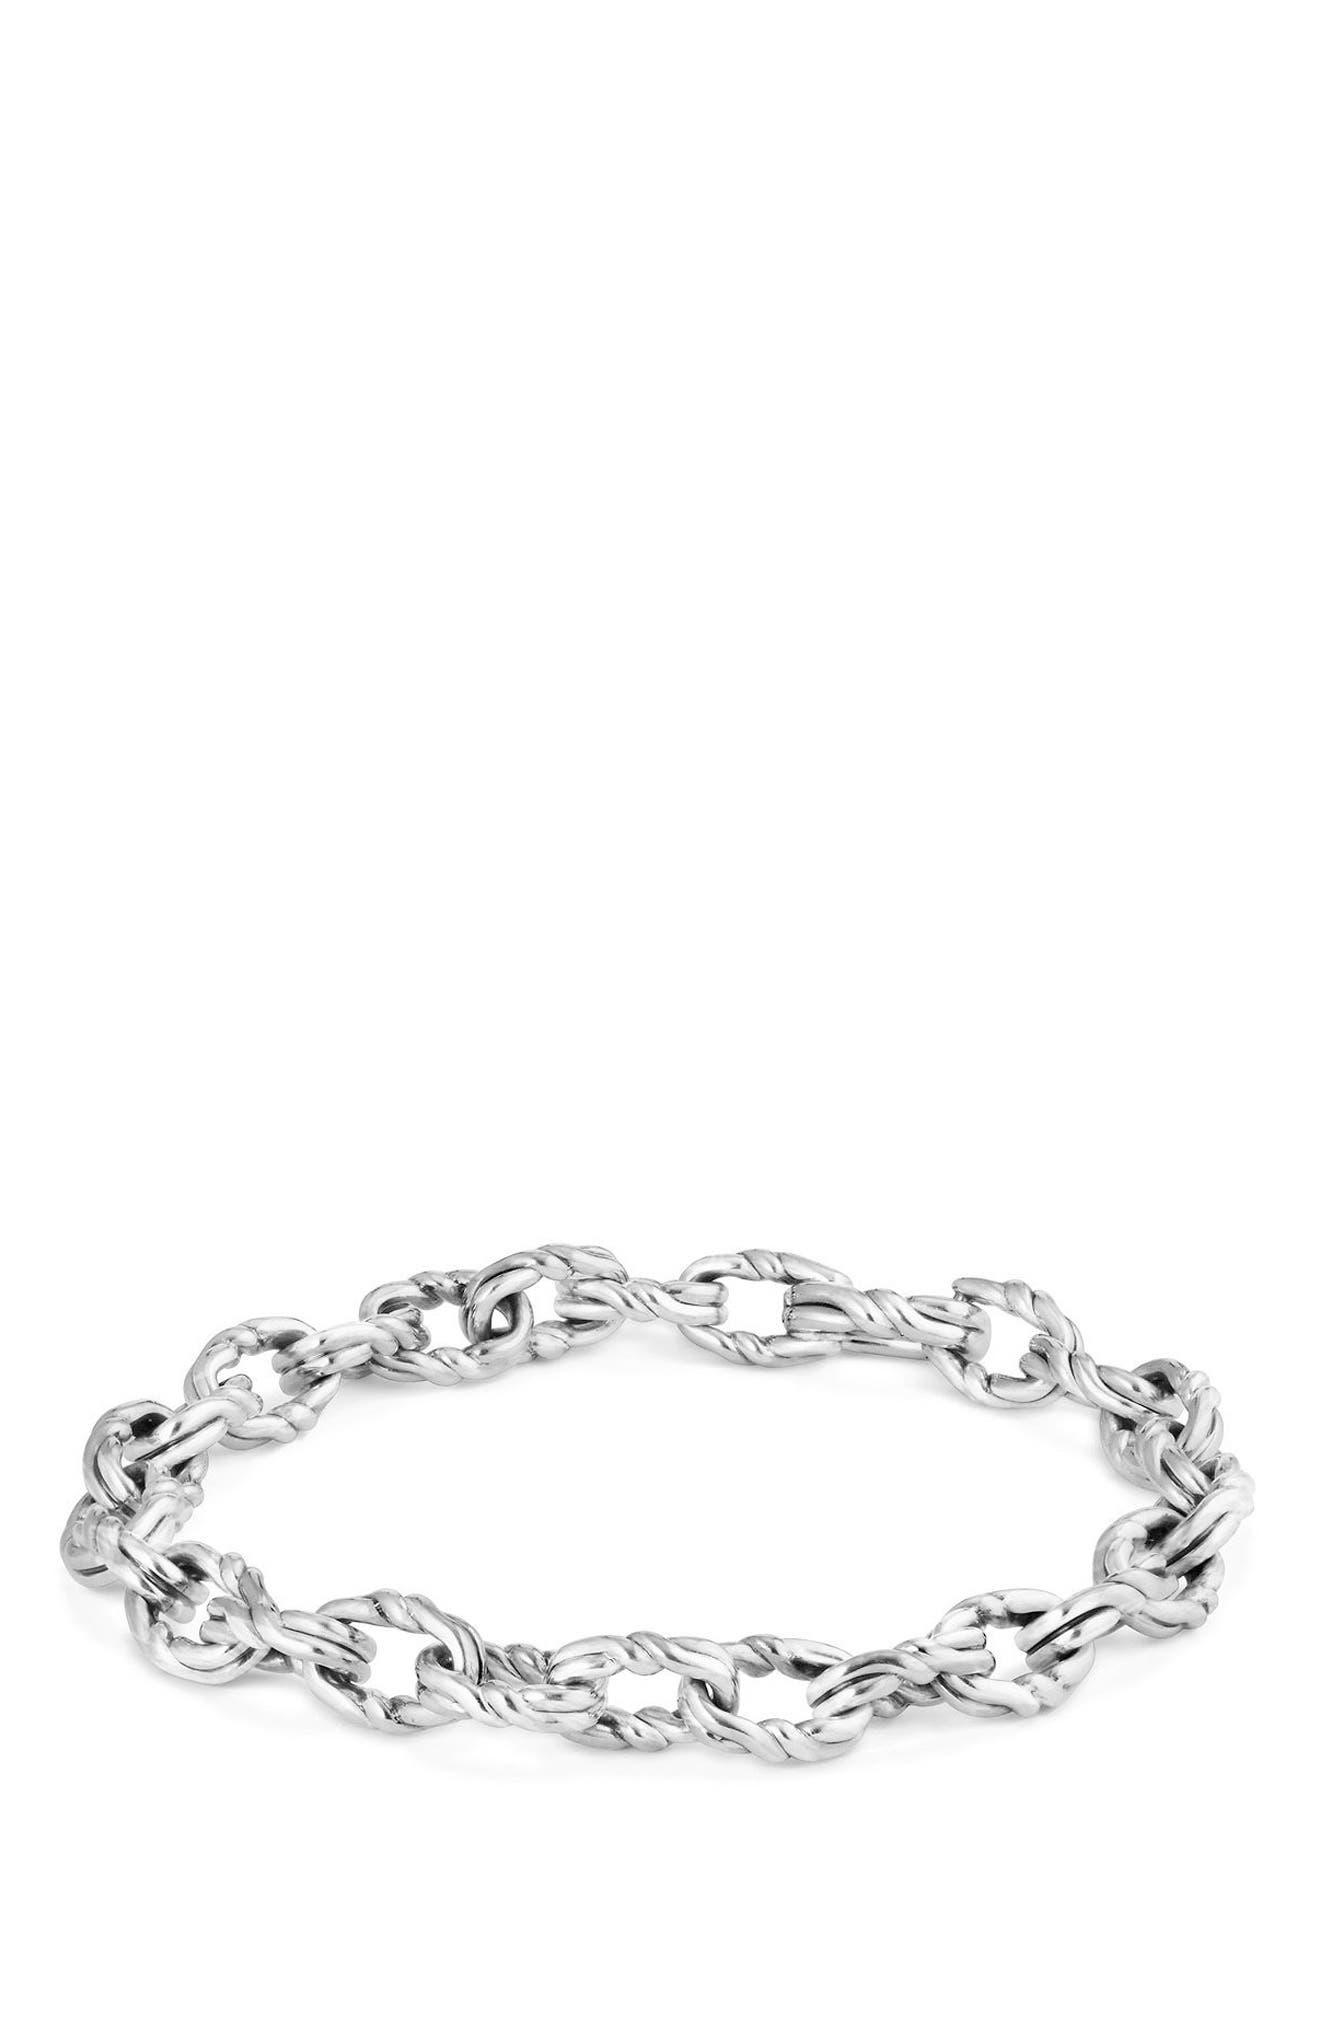 Alternate Image 1 Selected - David Yurman Continuance Chain Bracelet